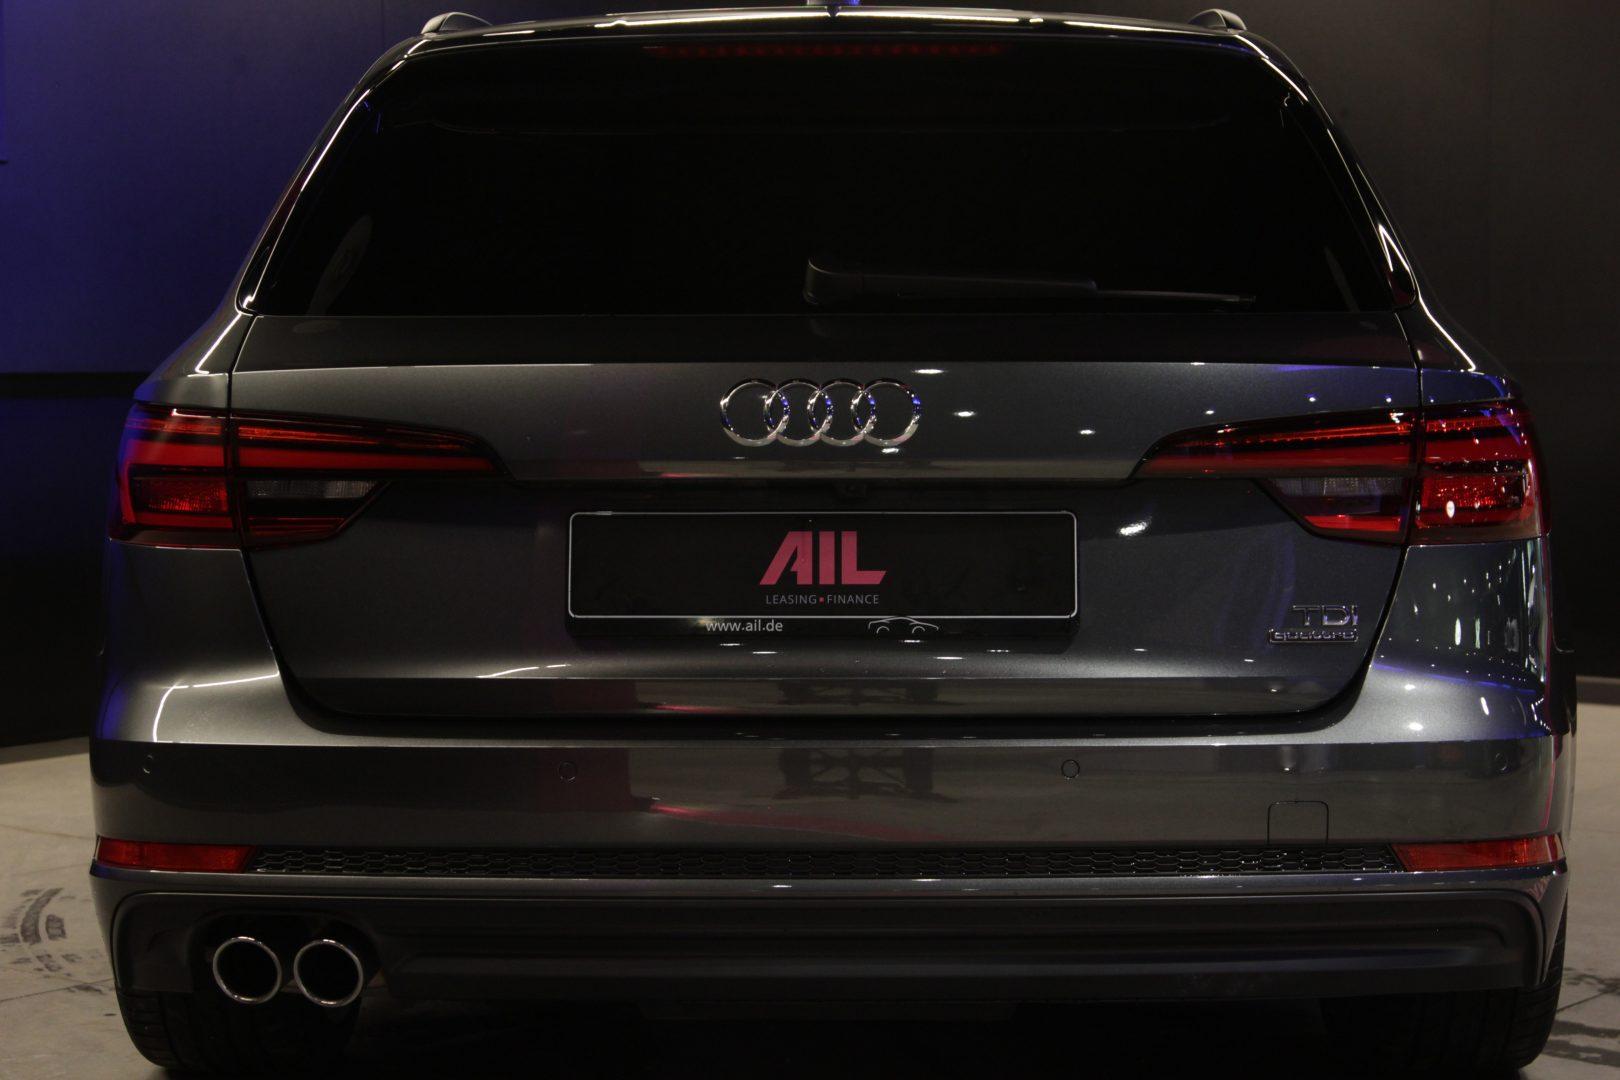 AIL Audi A4 Avant S line Sport / Plus quattro 3.0 TDI 11